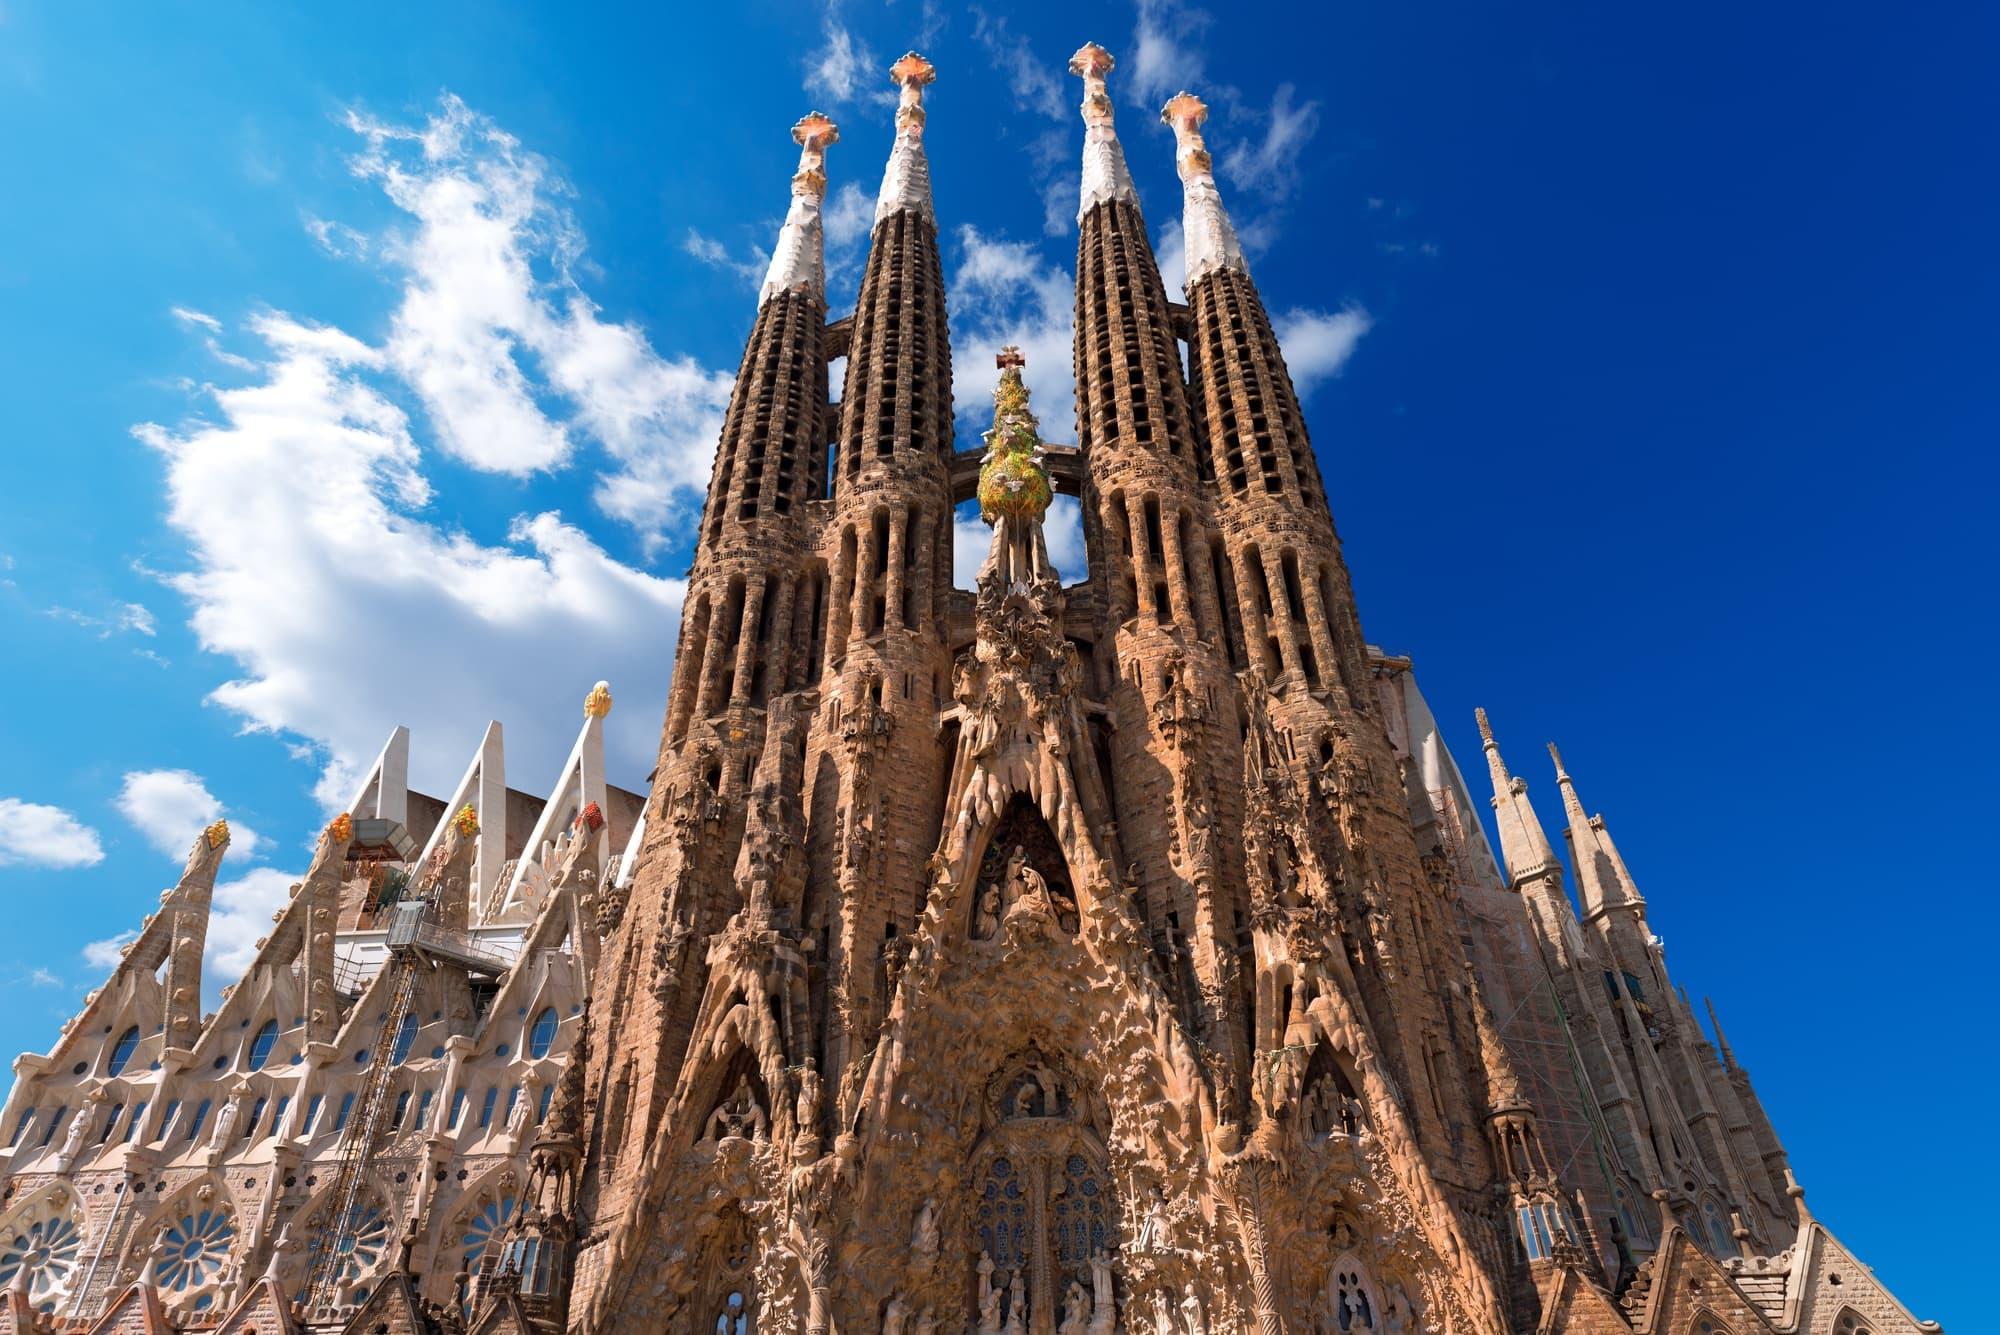 The famous Catholic basilica of the Sagrada Familia in Barcelona with kids